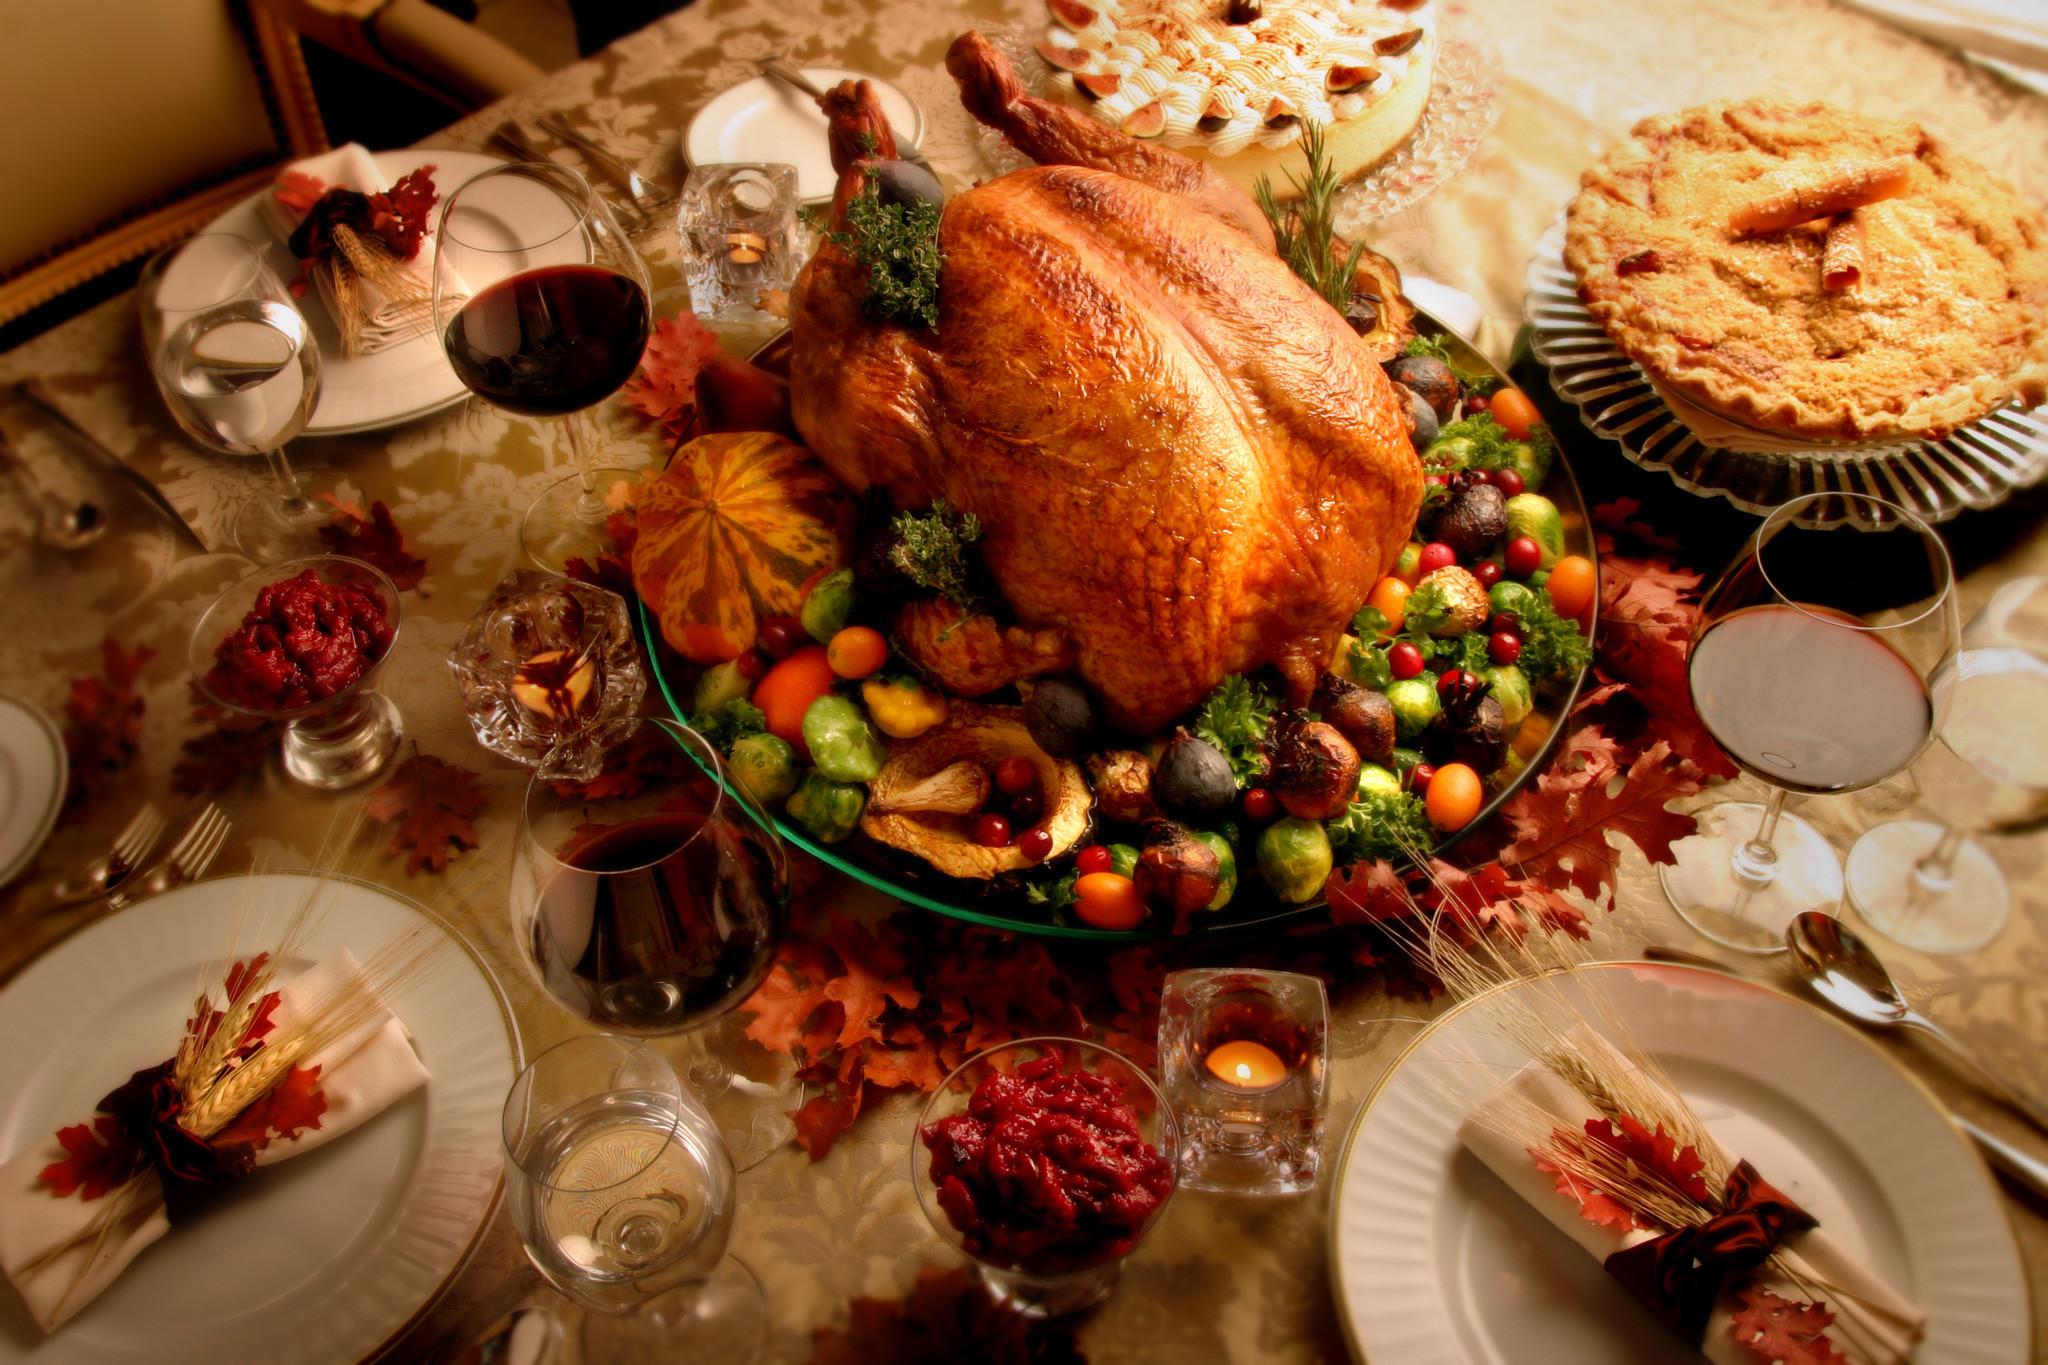 Gracias The Thanksgiving Turkey  November 2019 Events Calendar for Los Angeles